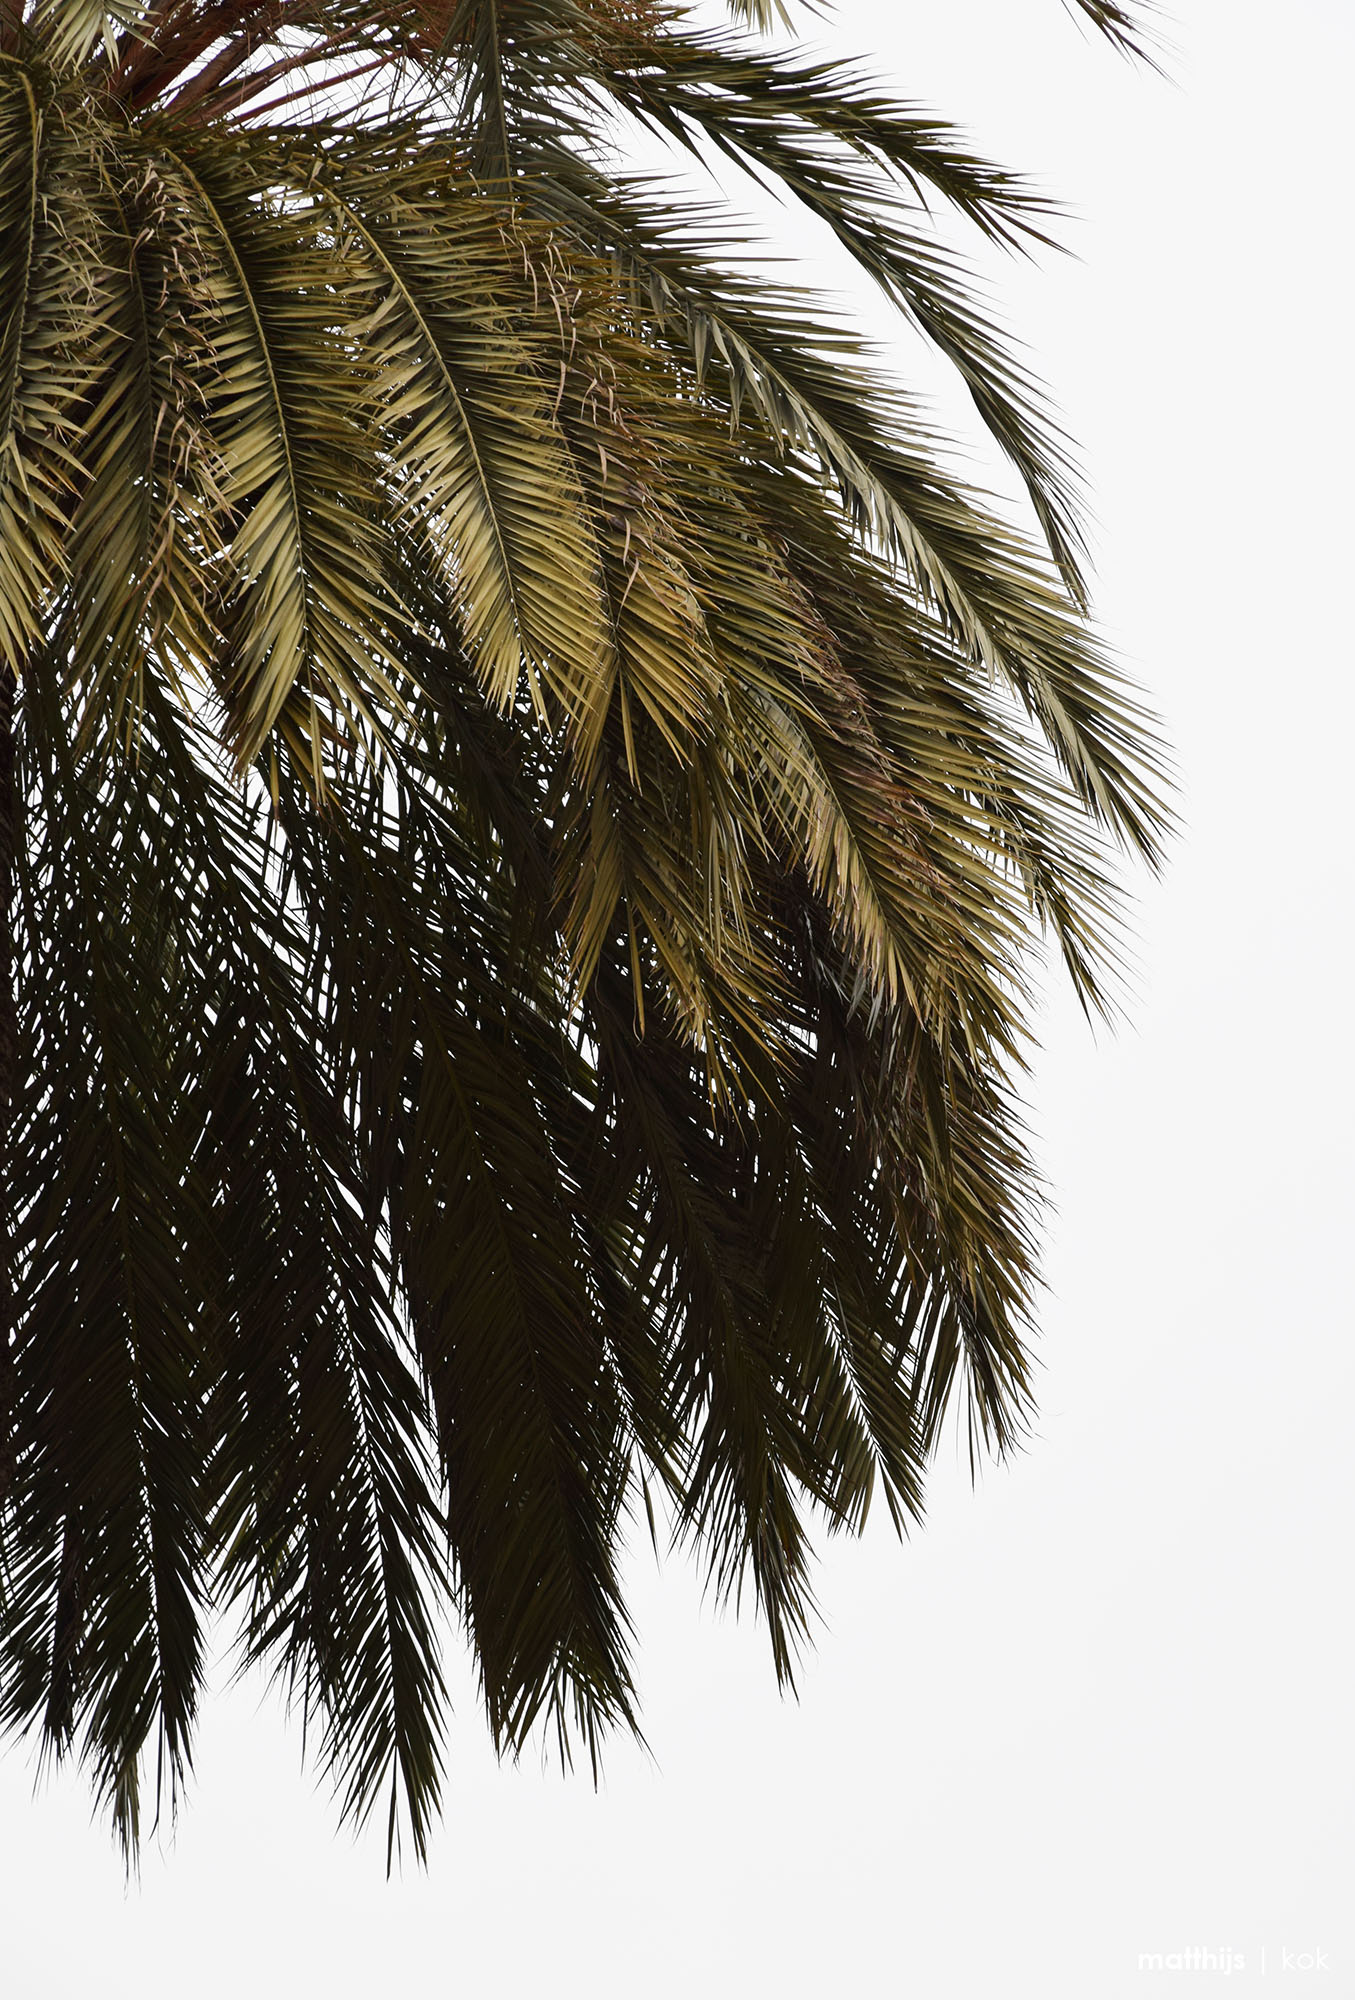 Palm, Barcelona, Spain | Photo by Matthijs Kok